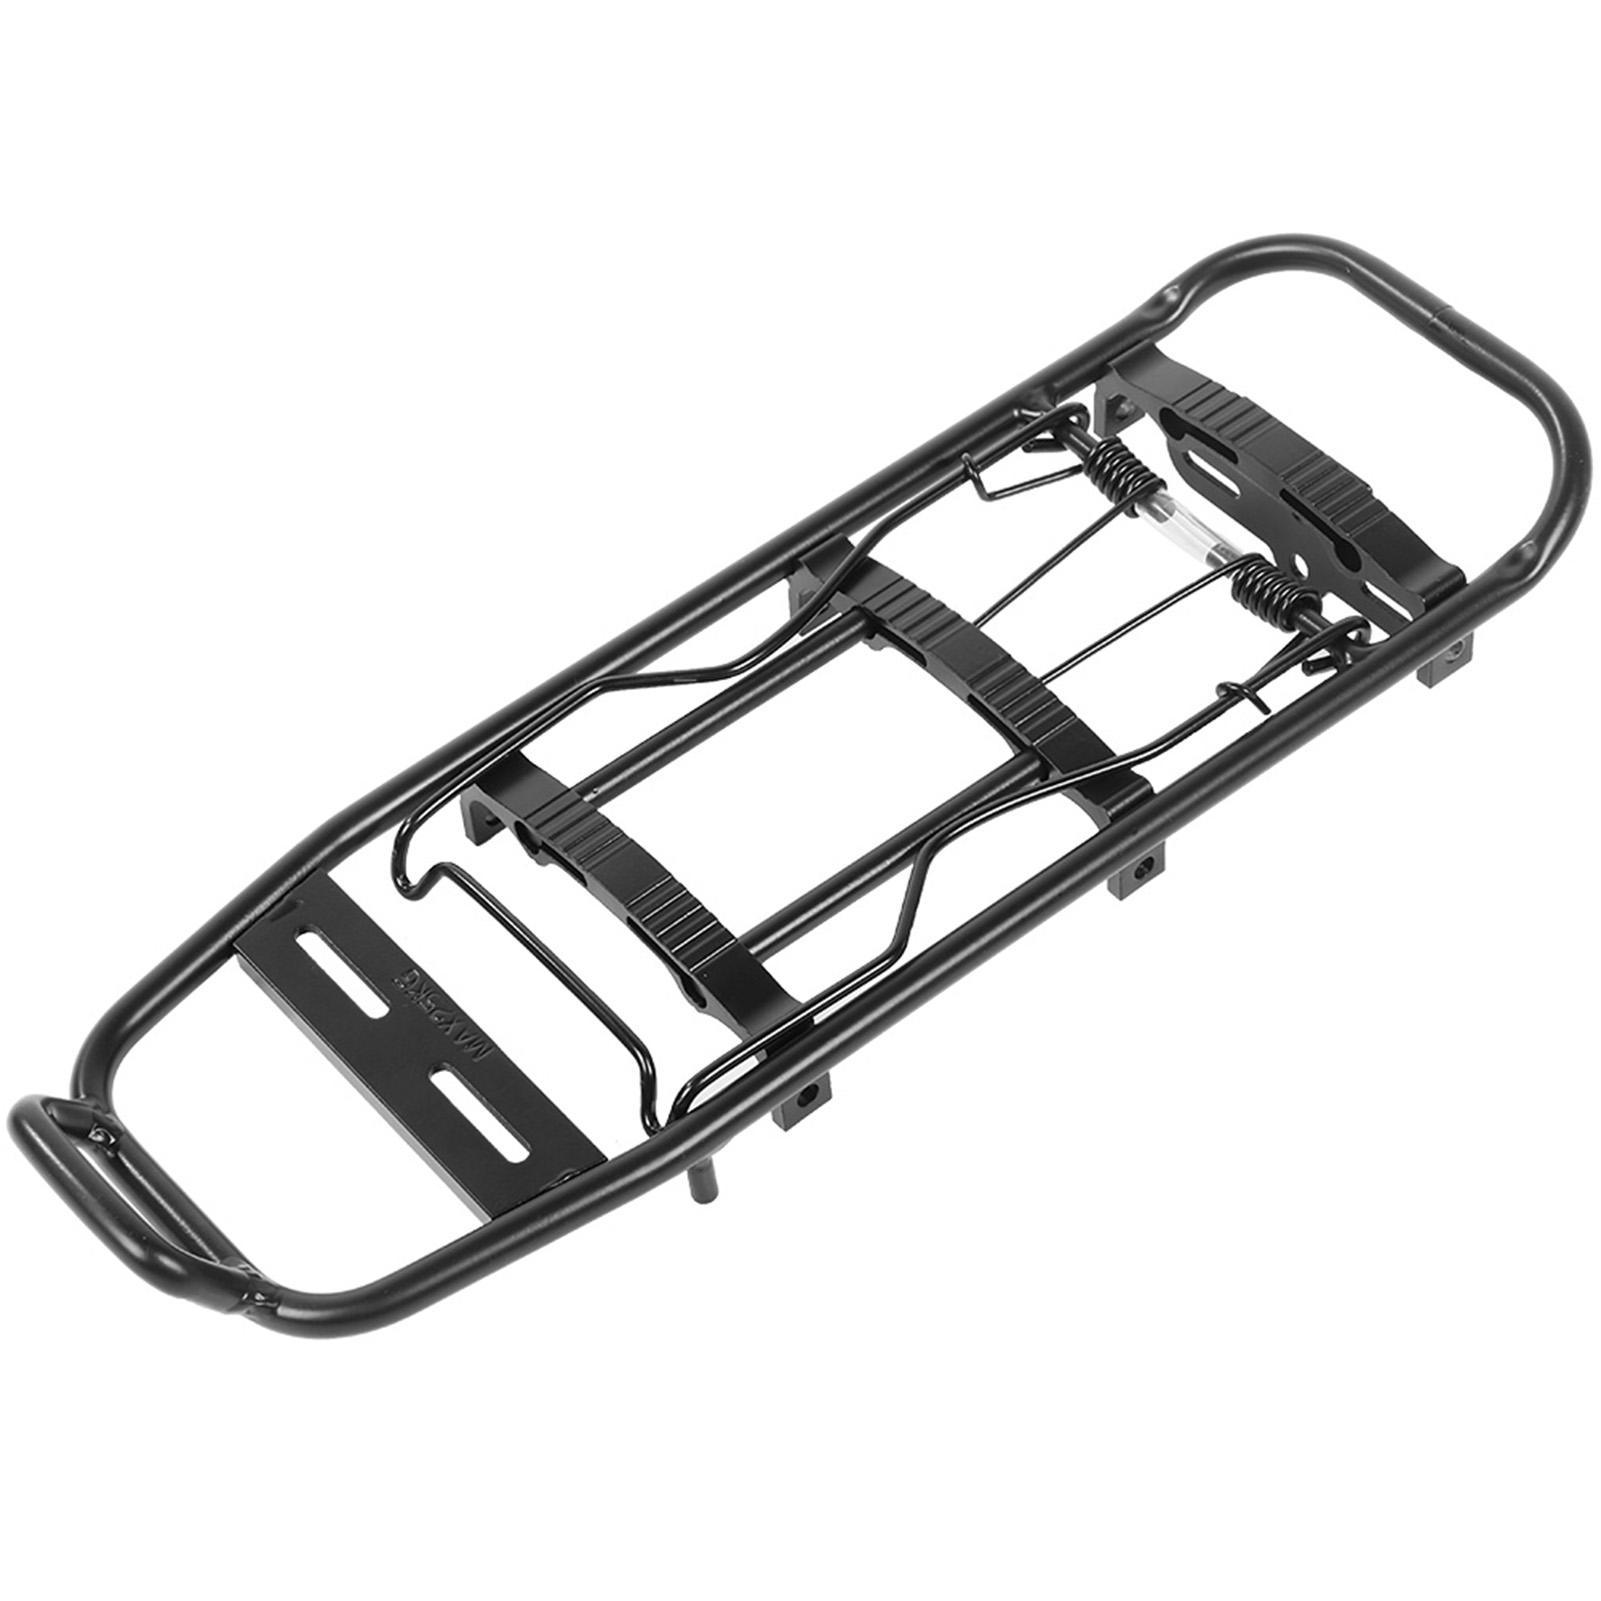 Tail Light Bicycle Mountain Bike Rear Rack Seat Mount Pannier Luggage Carrier W